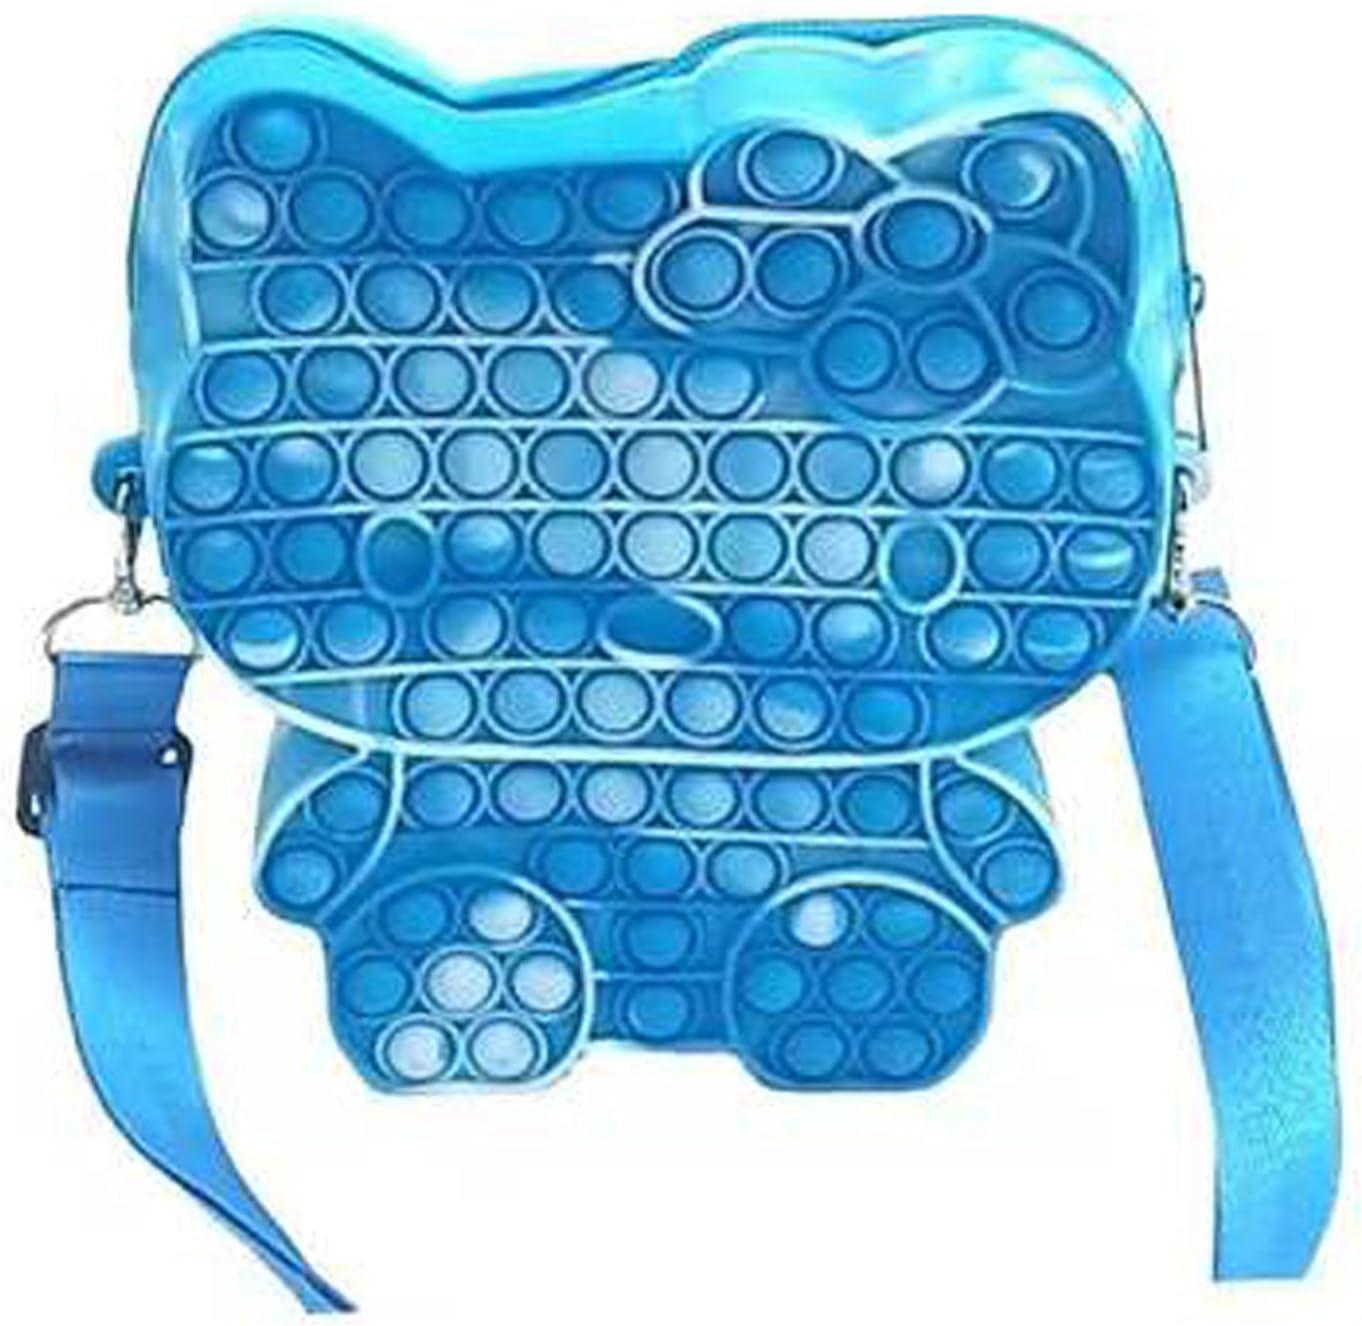 Pop Fidget Toys It Free shipping / New Crossbody Handbag Girls Women Sale Push Bubbl for